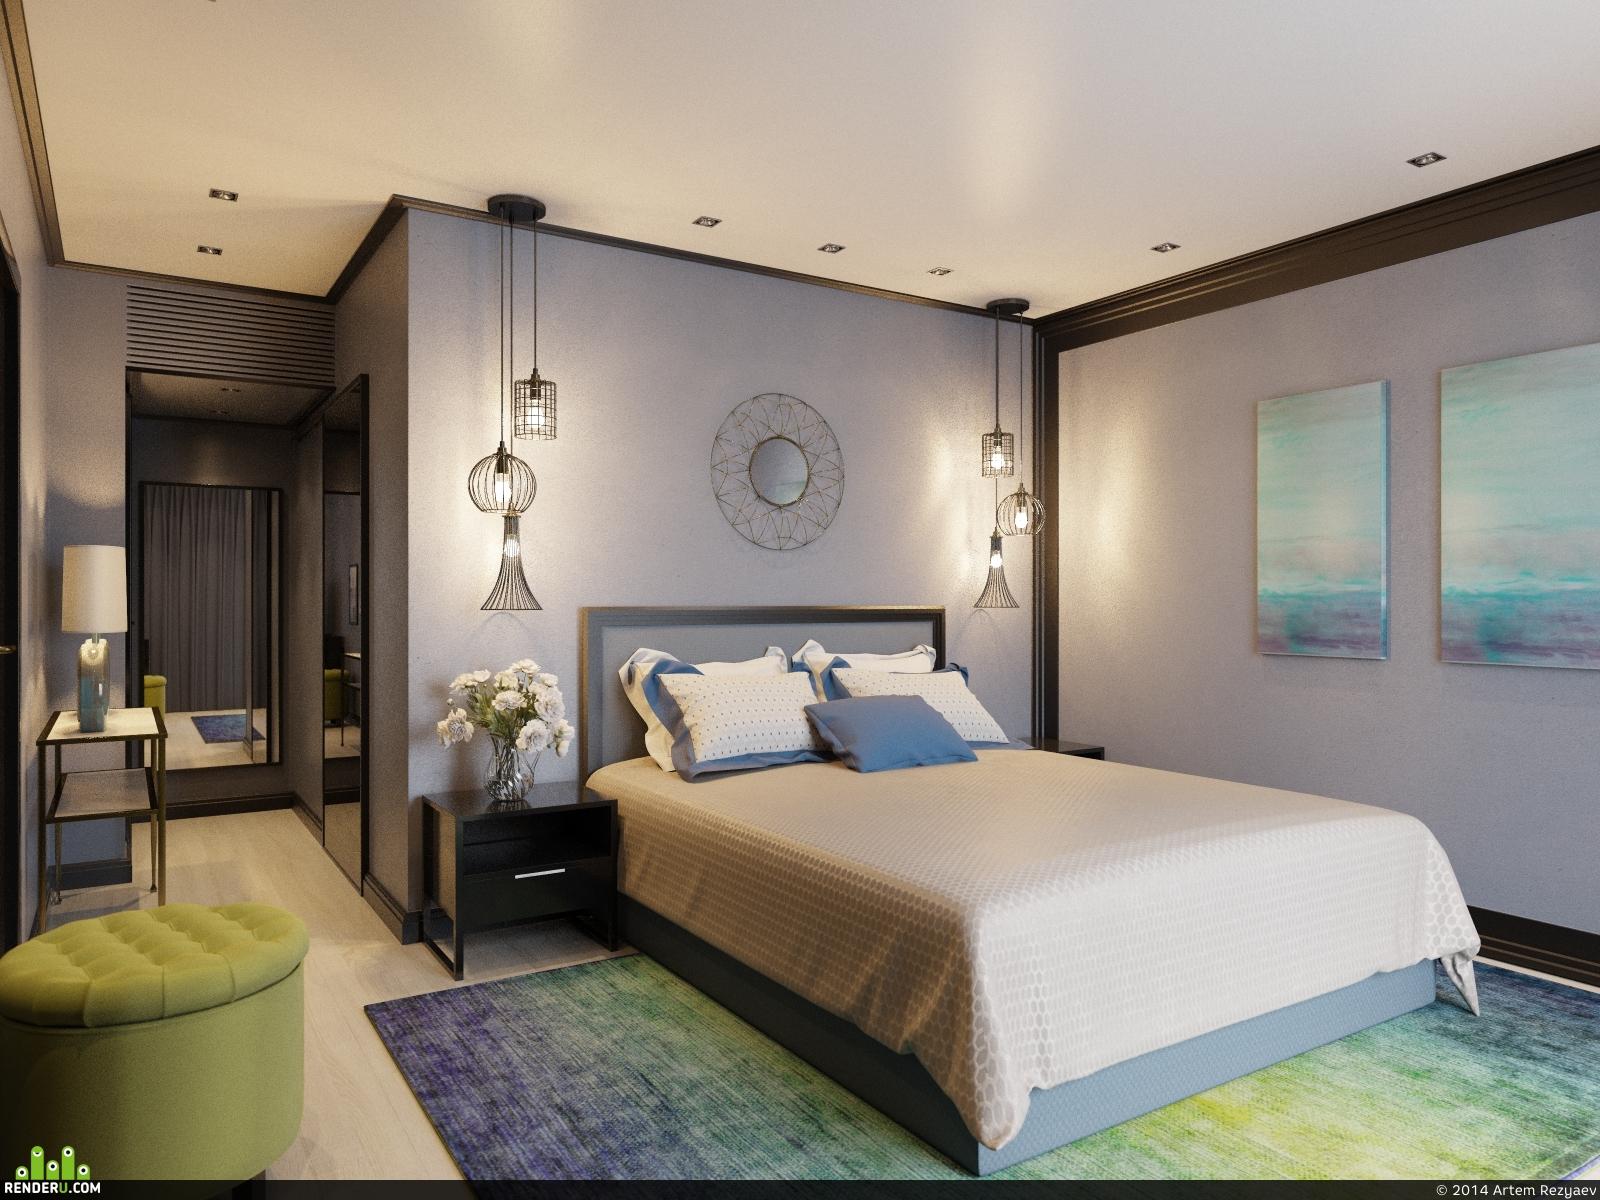 preview визуализация спальни